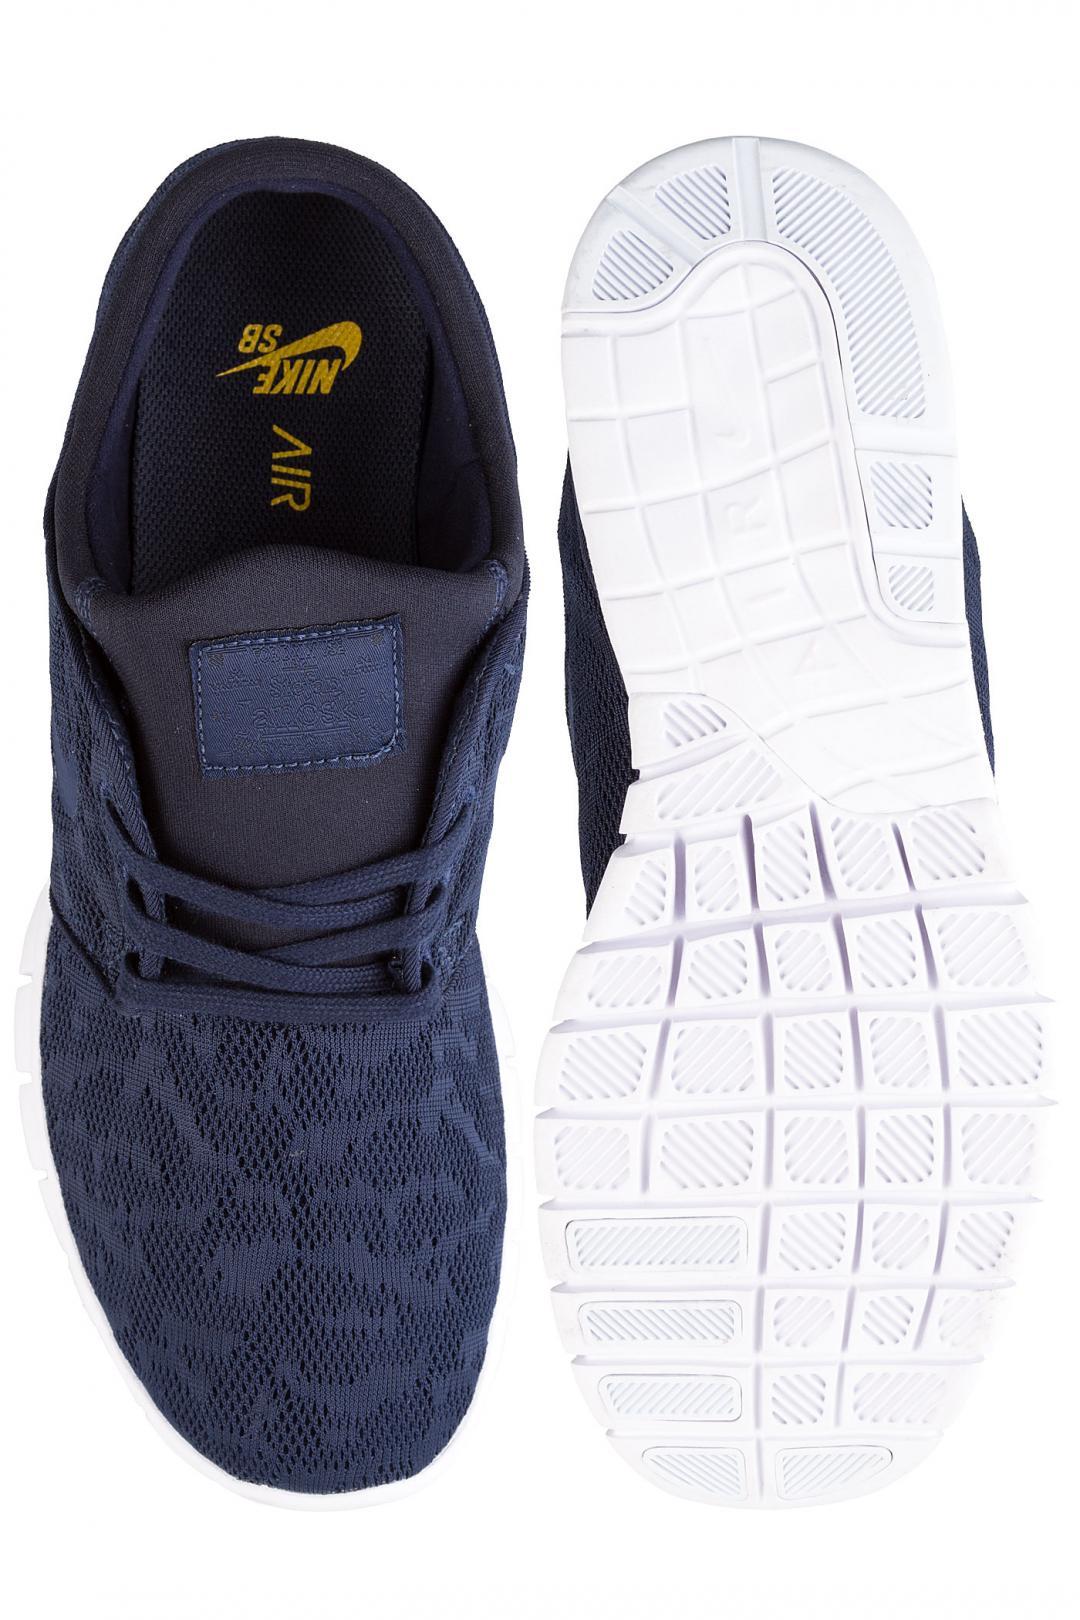 Uomo/Donna Nike SB Stefan Janoski Max obsidian mineral gold   Sneaker